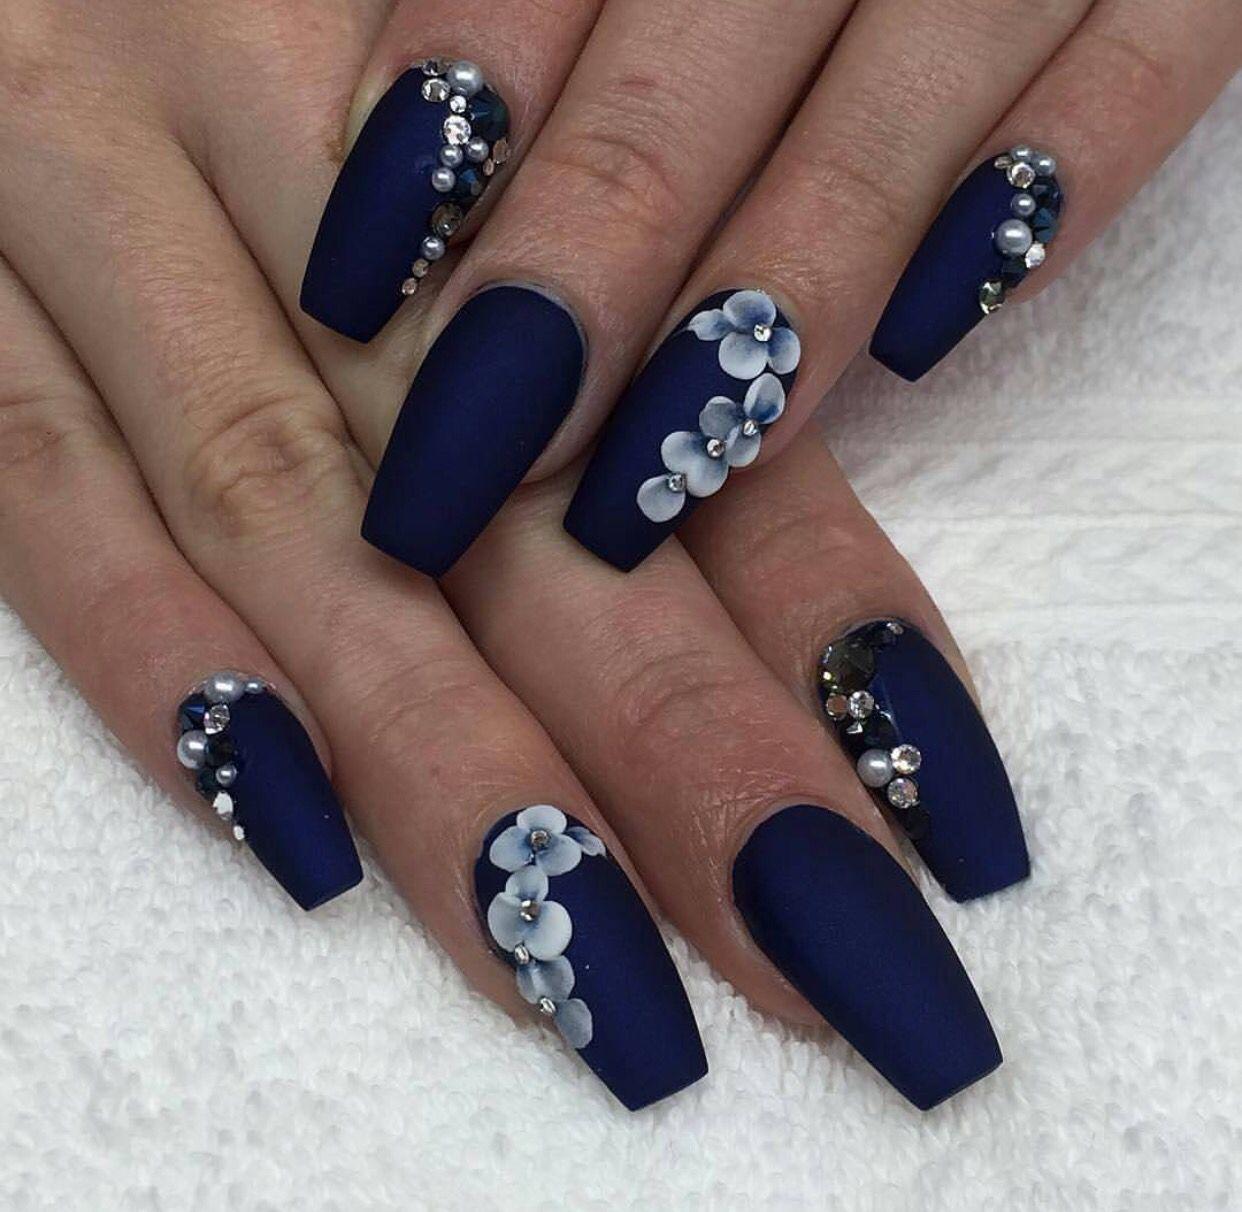 30 Brilliant Image Of Marine Style Nail Art Design Ideas Blue